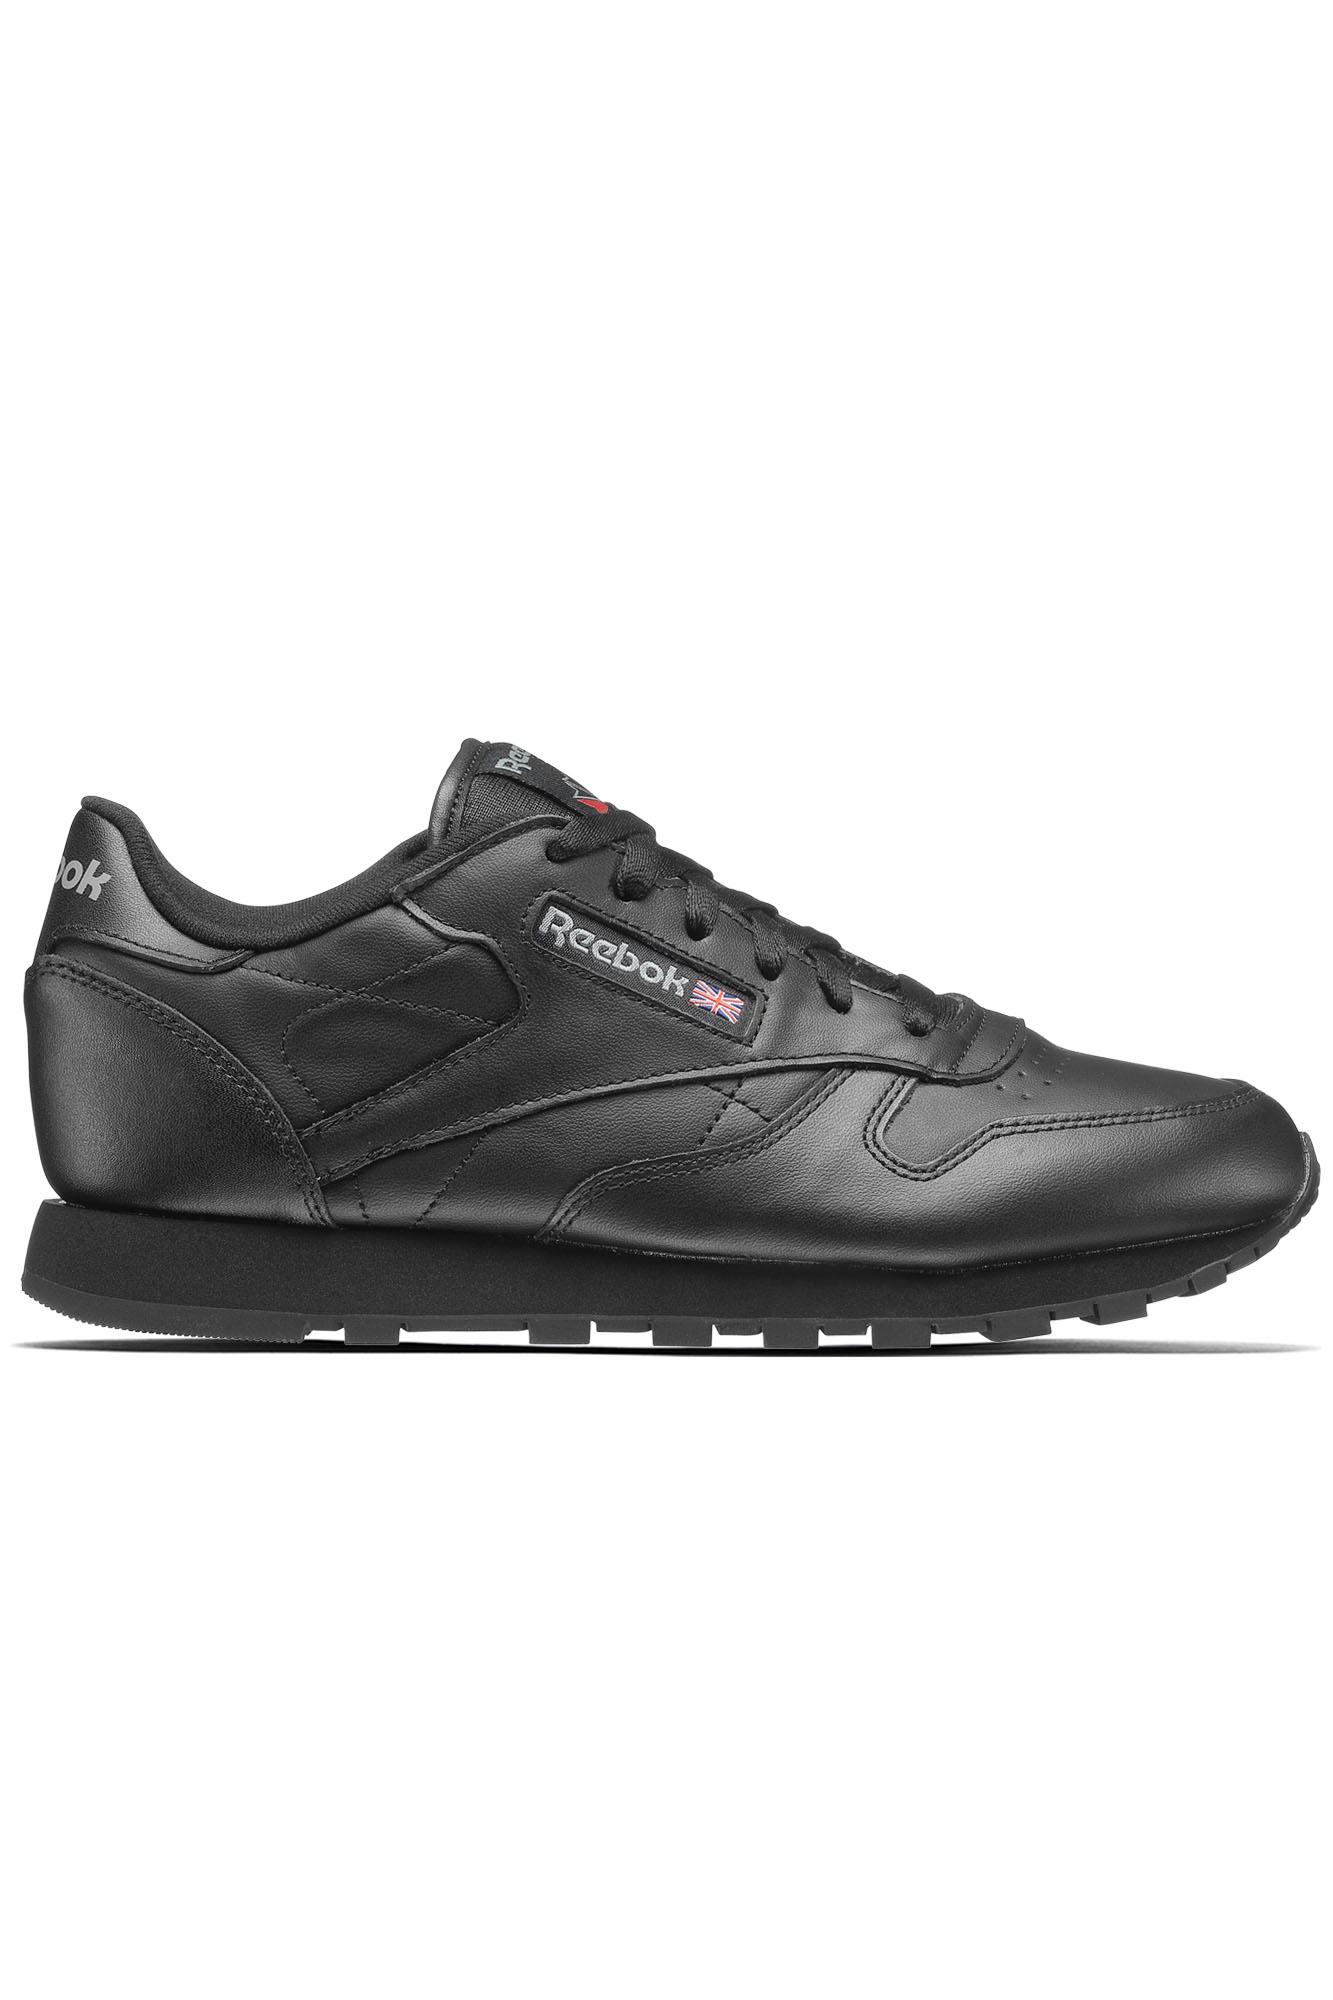 Buty Reebok Classic Leather 3912 37.5